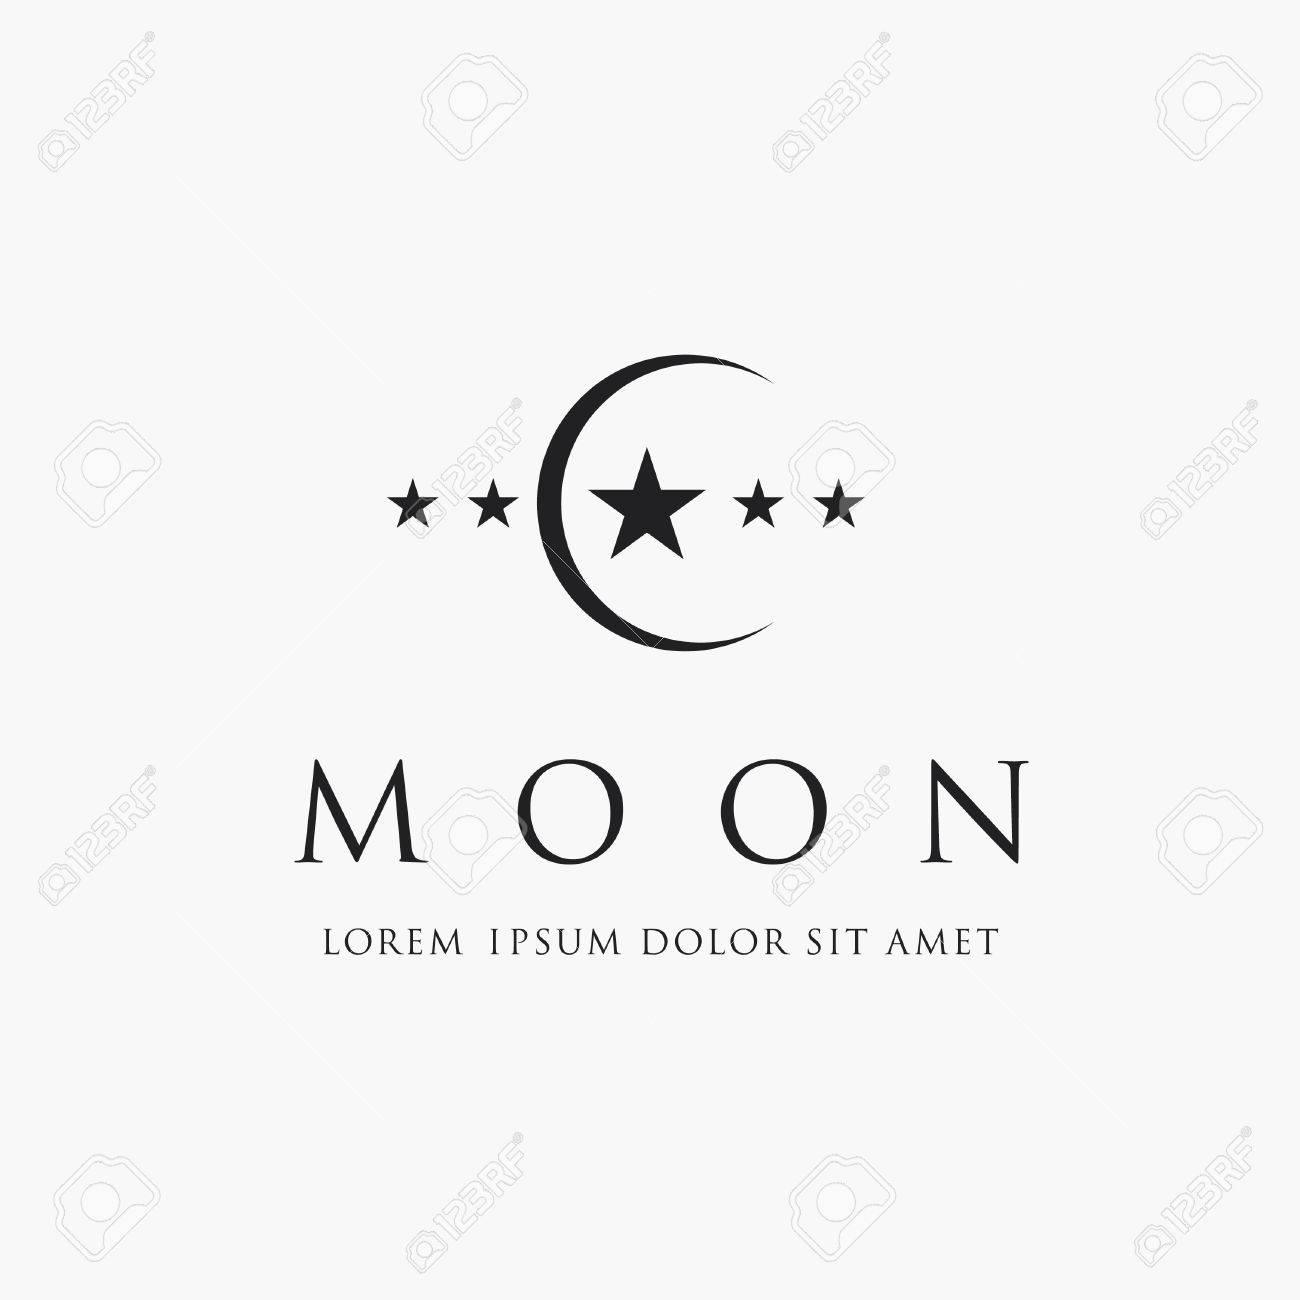 Moon And Star Logo Islam Symbol Royalty Free Kliparty Vektory A